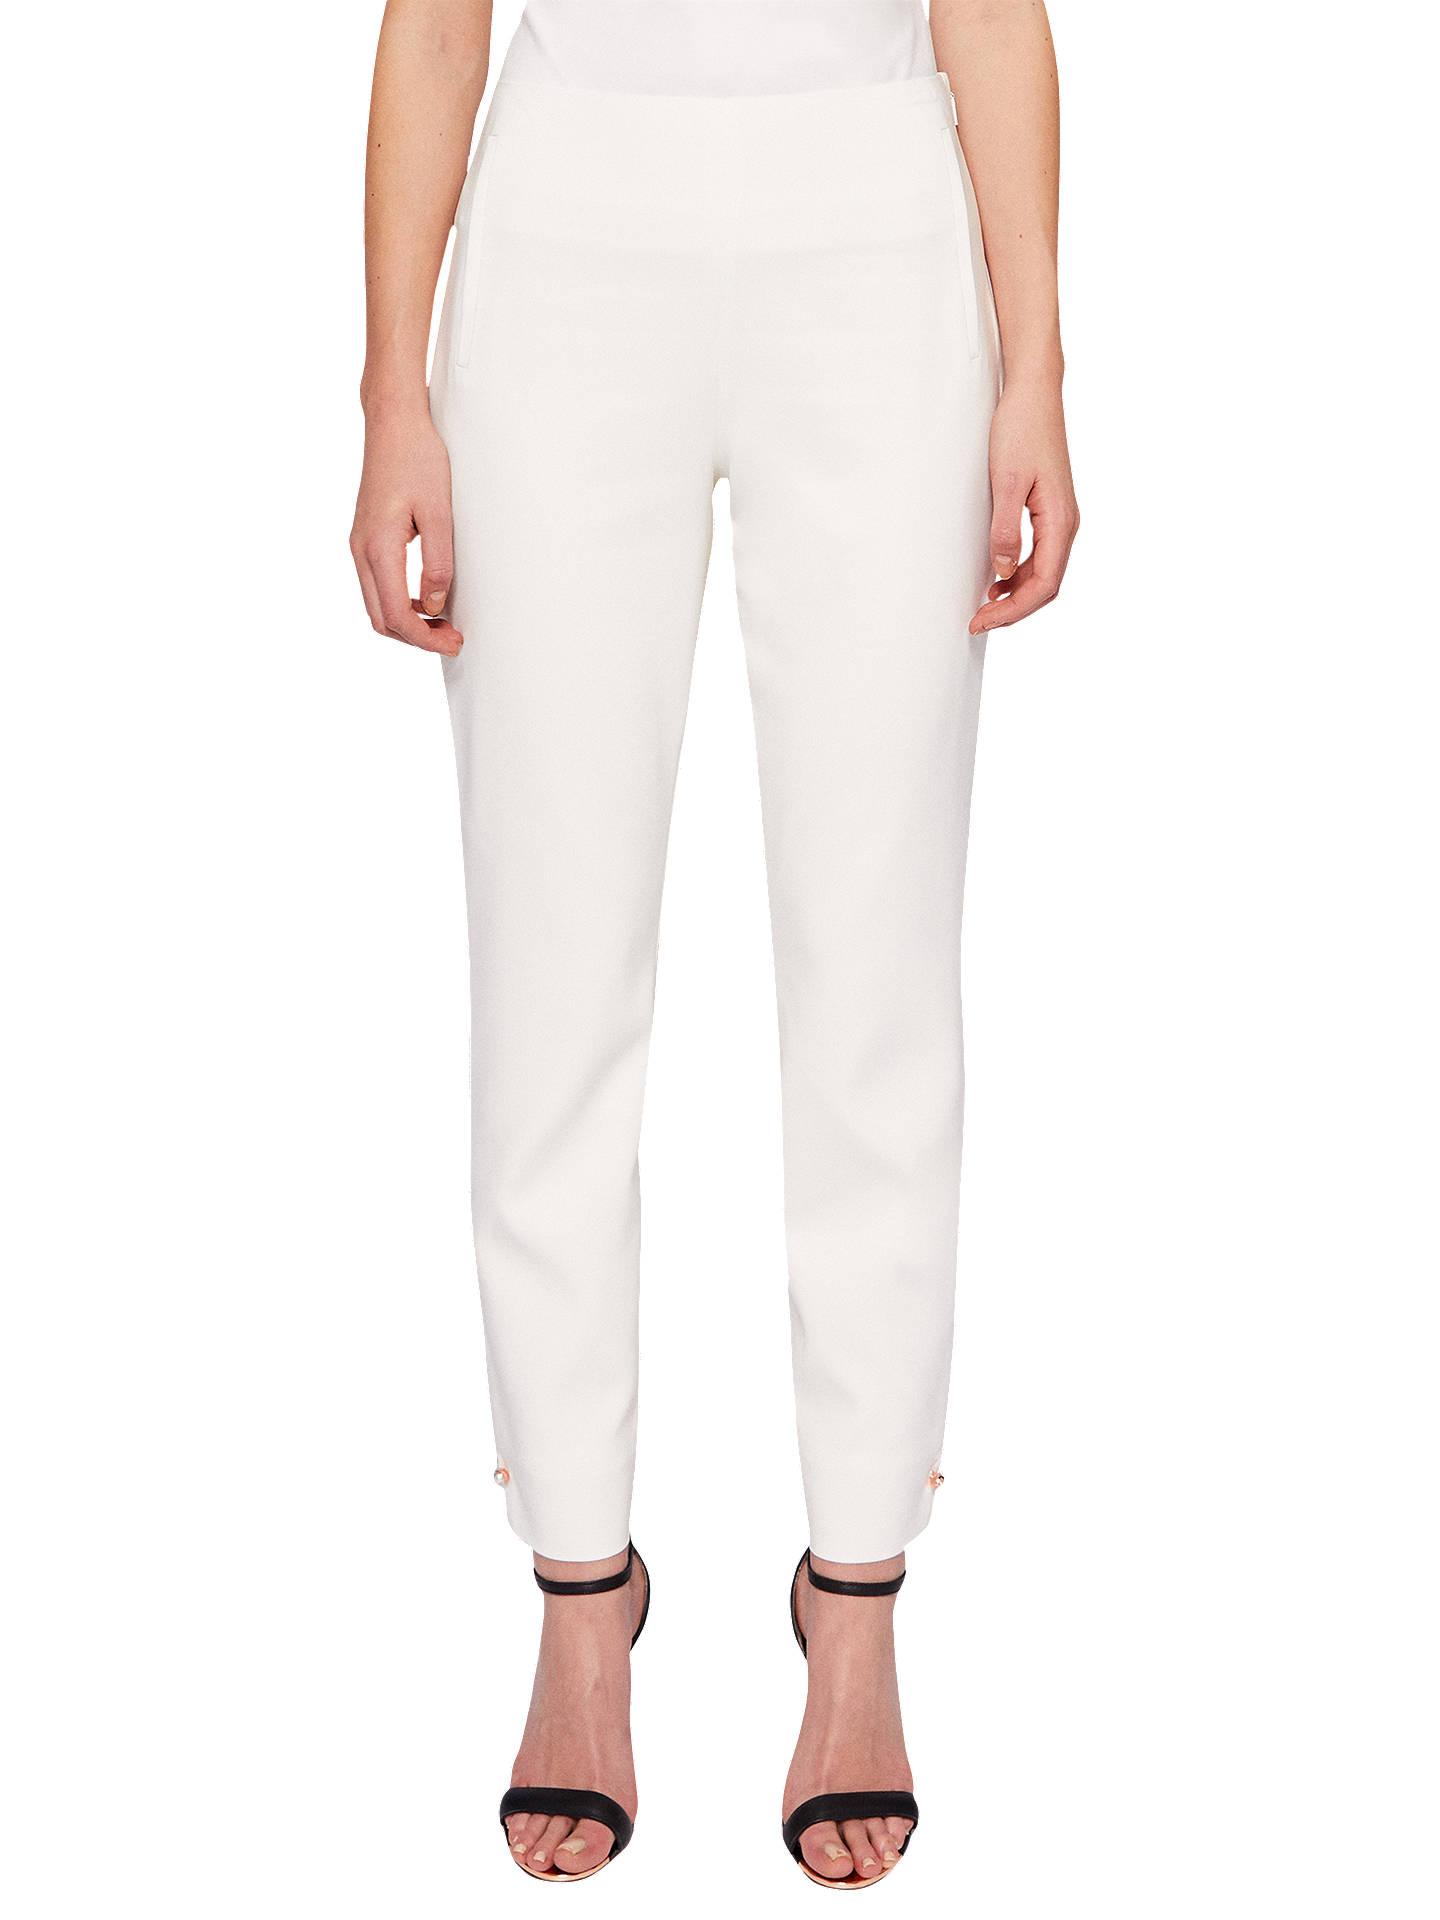 671b5e6f7 Buy Ted Baker Lalyat Pearl Detail Skinny Trousers